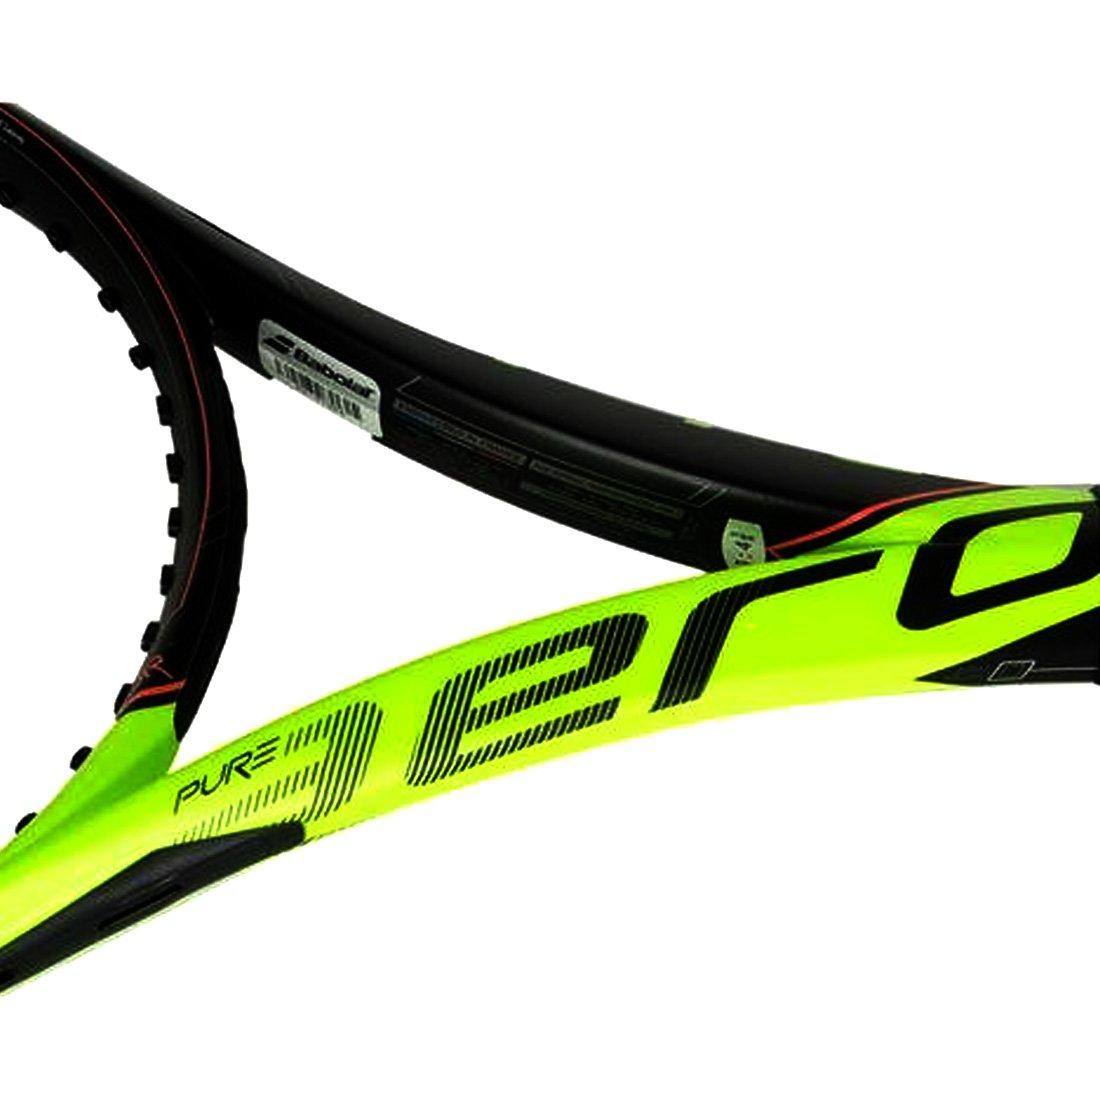 Amazon.com : Babolat-Pure Aero Tour Tennis Racquet-() : Sports & Outdoors